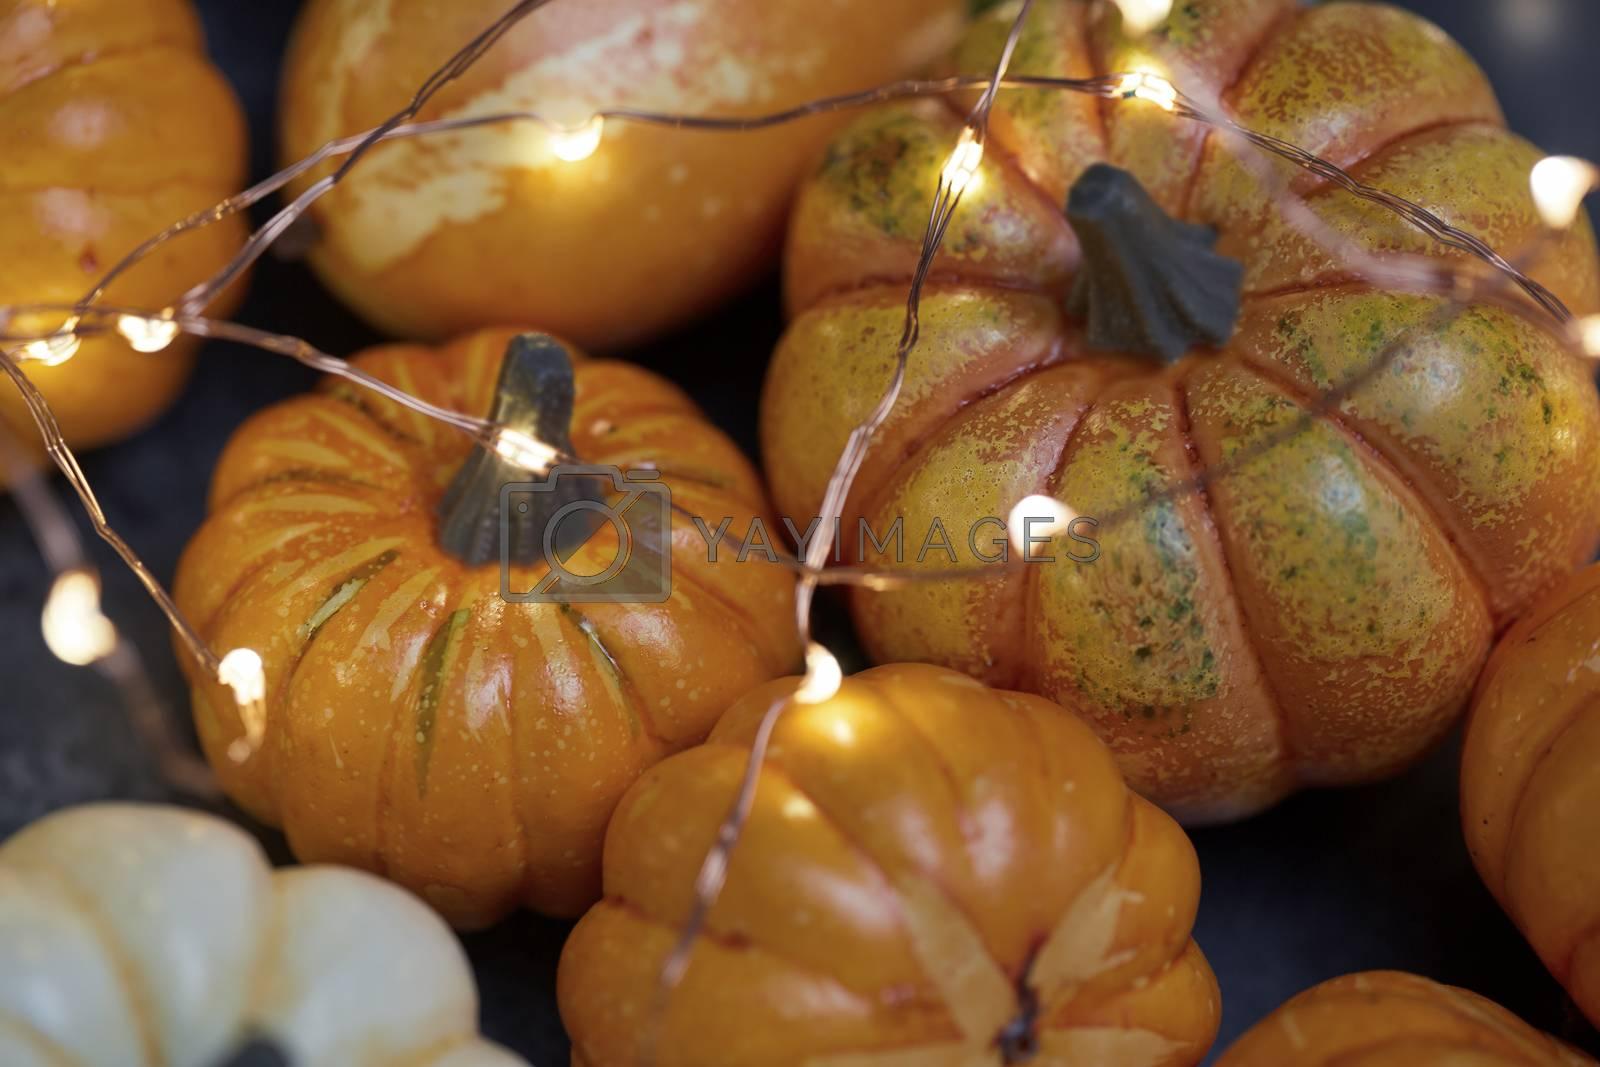 Halloween pumpkins with electric illumination